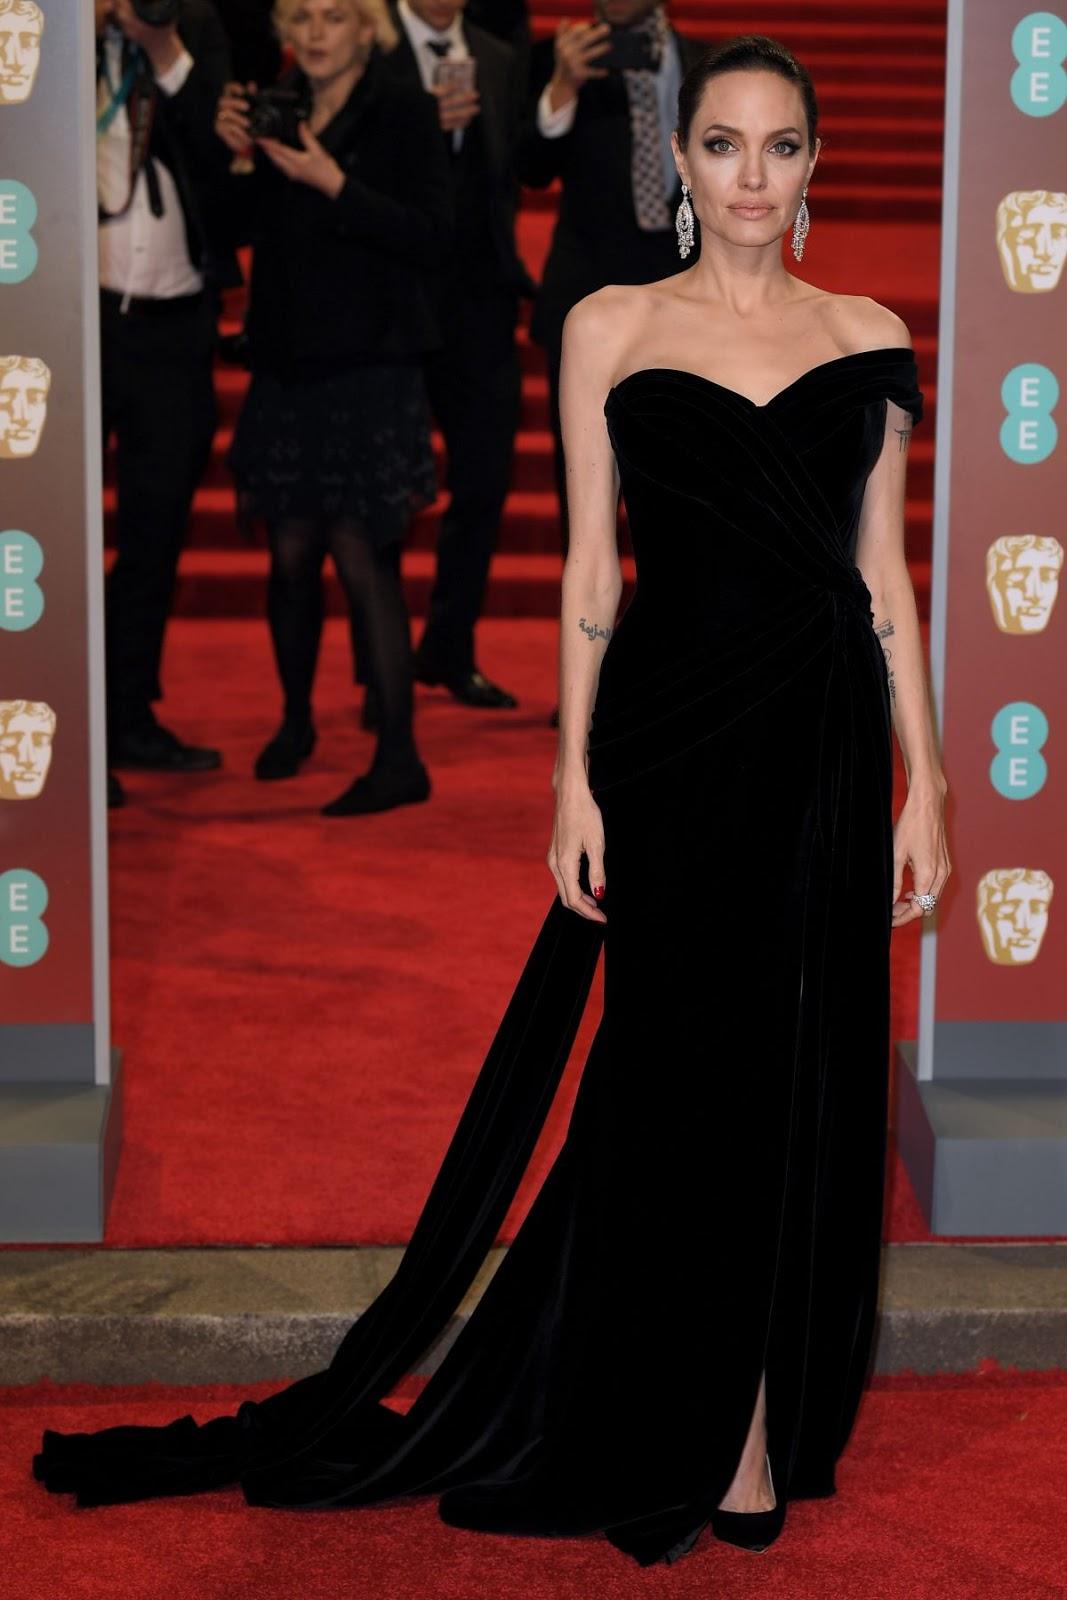 Angelina Jolie Wears 32 98 Carat Diamond Earrings At The